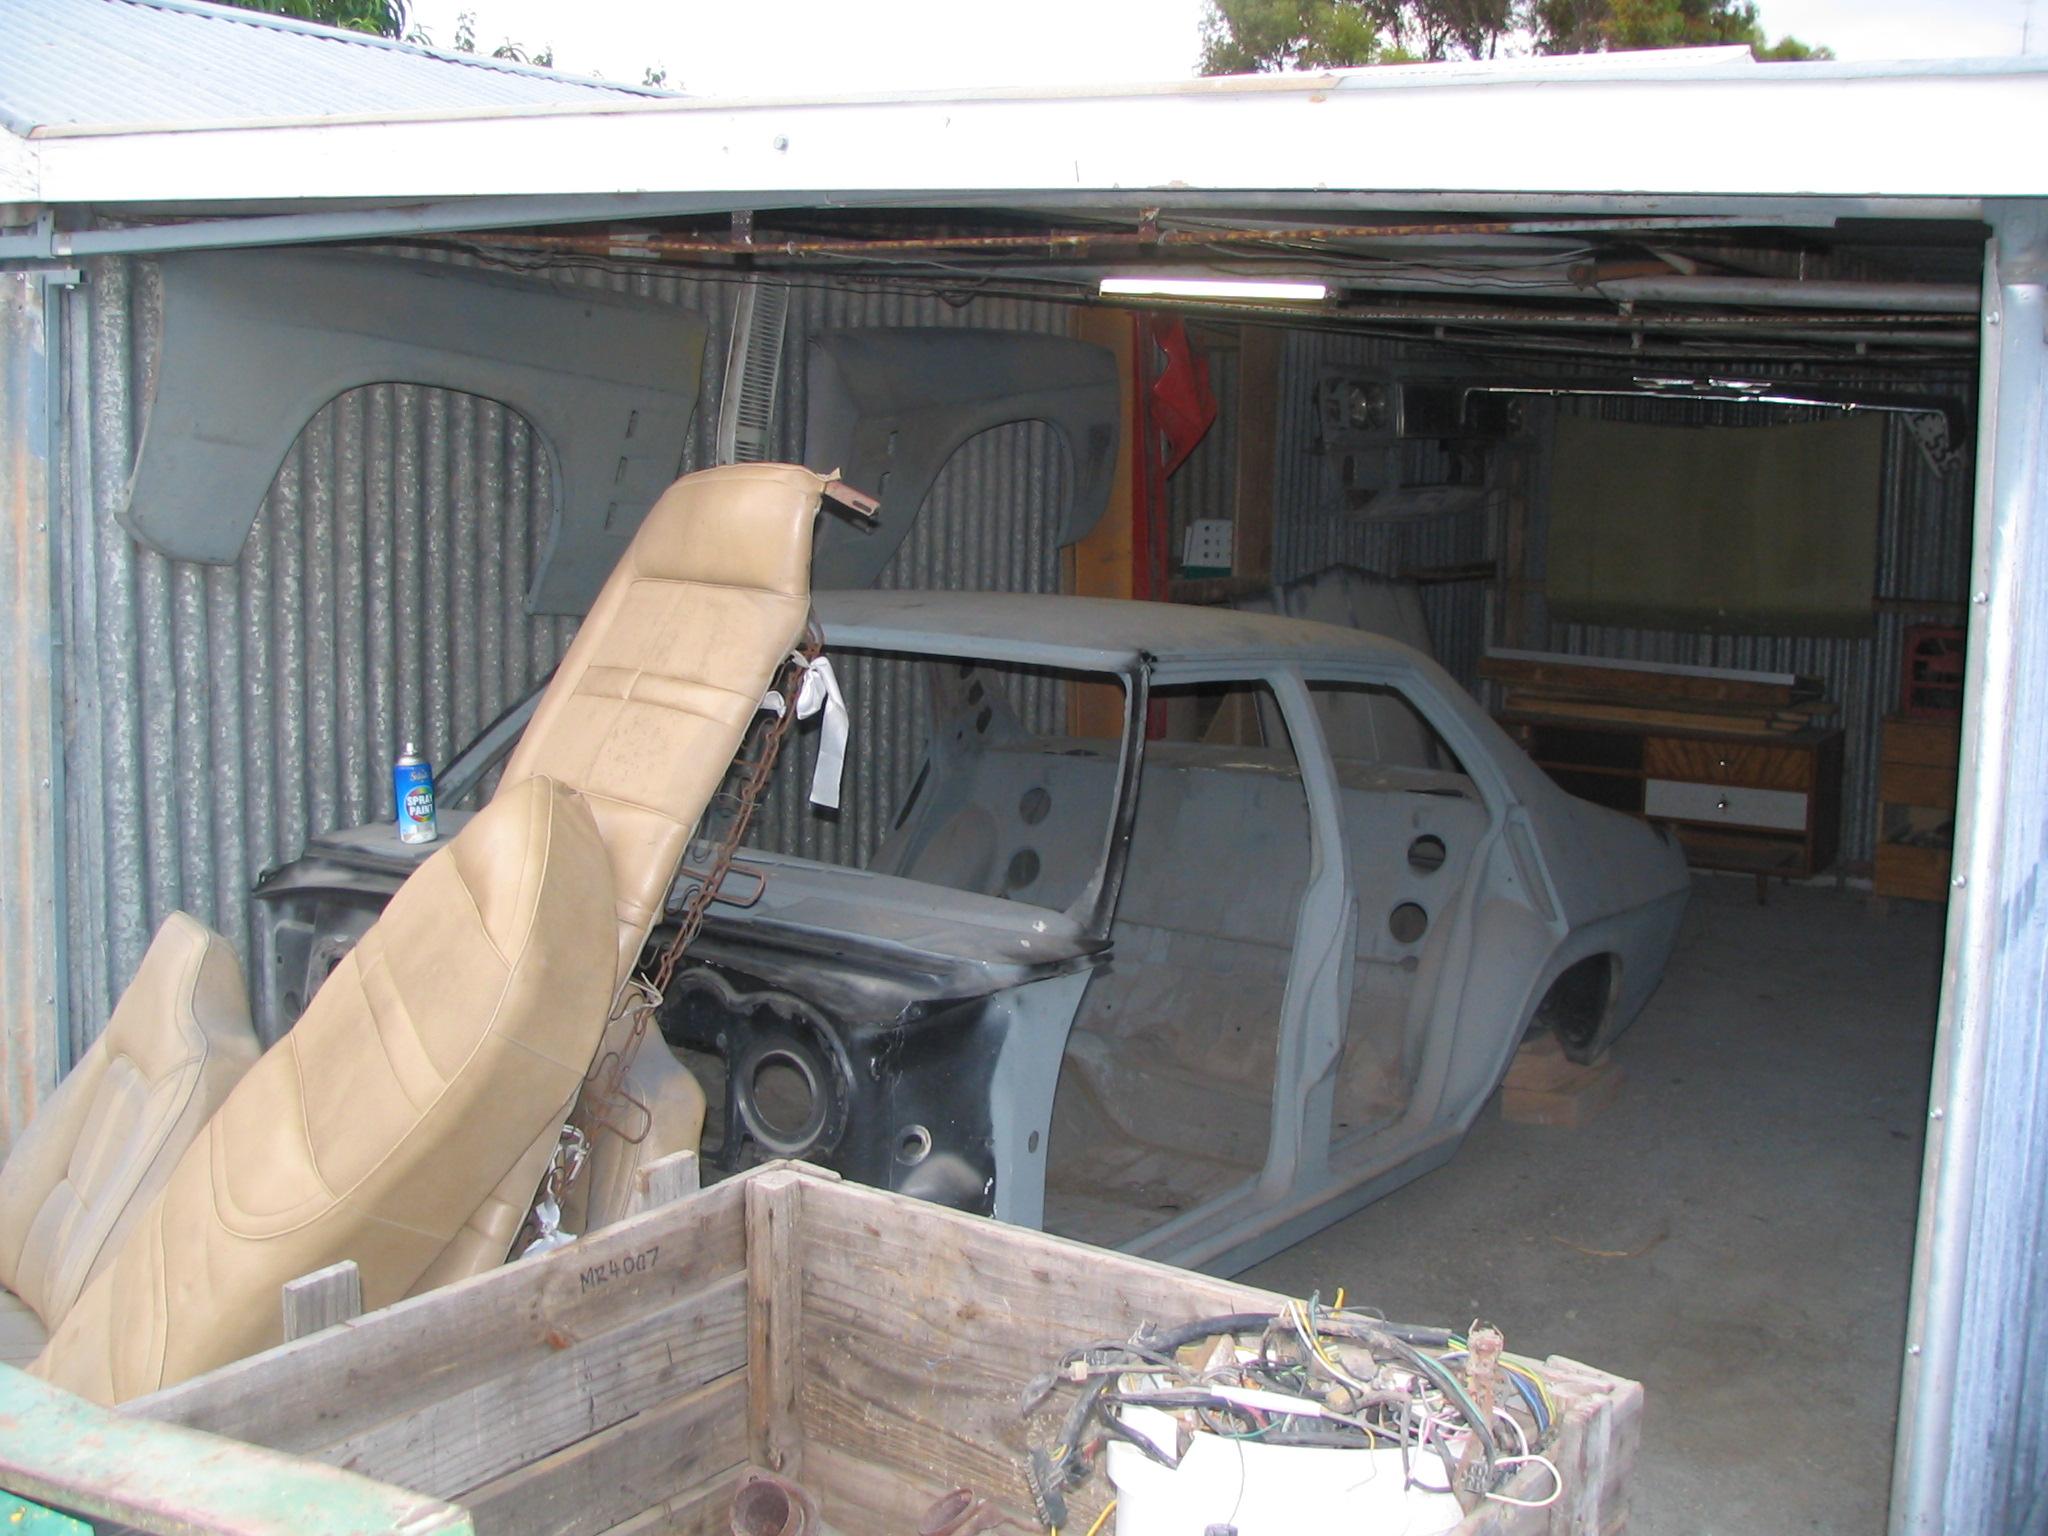 current trim original but all pulled apart original paint 568 30521 current paint 10year old primer original driveline l31 m41 gu4 [ 2048 x 1536 Pixel ]